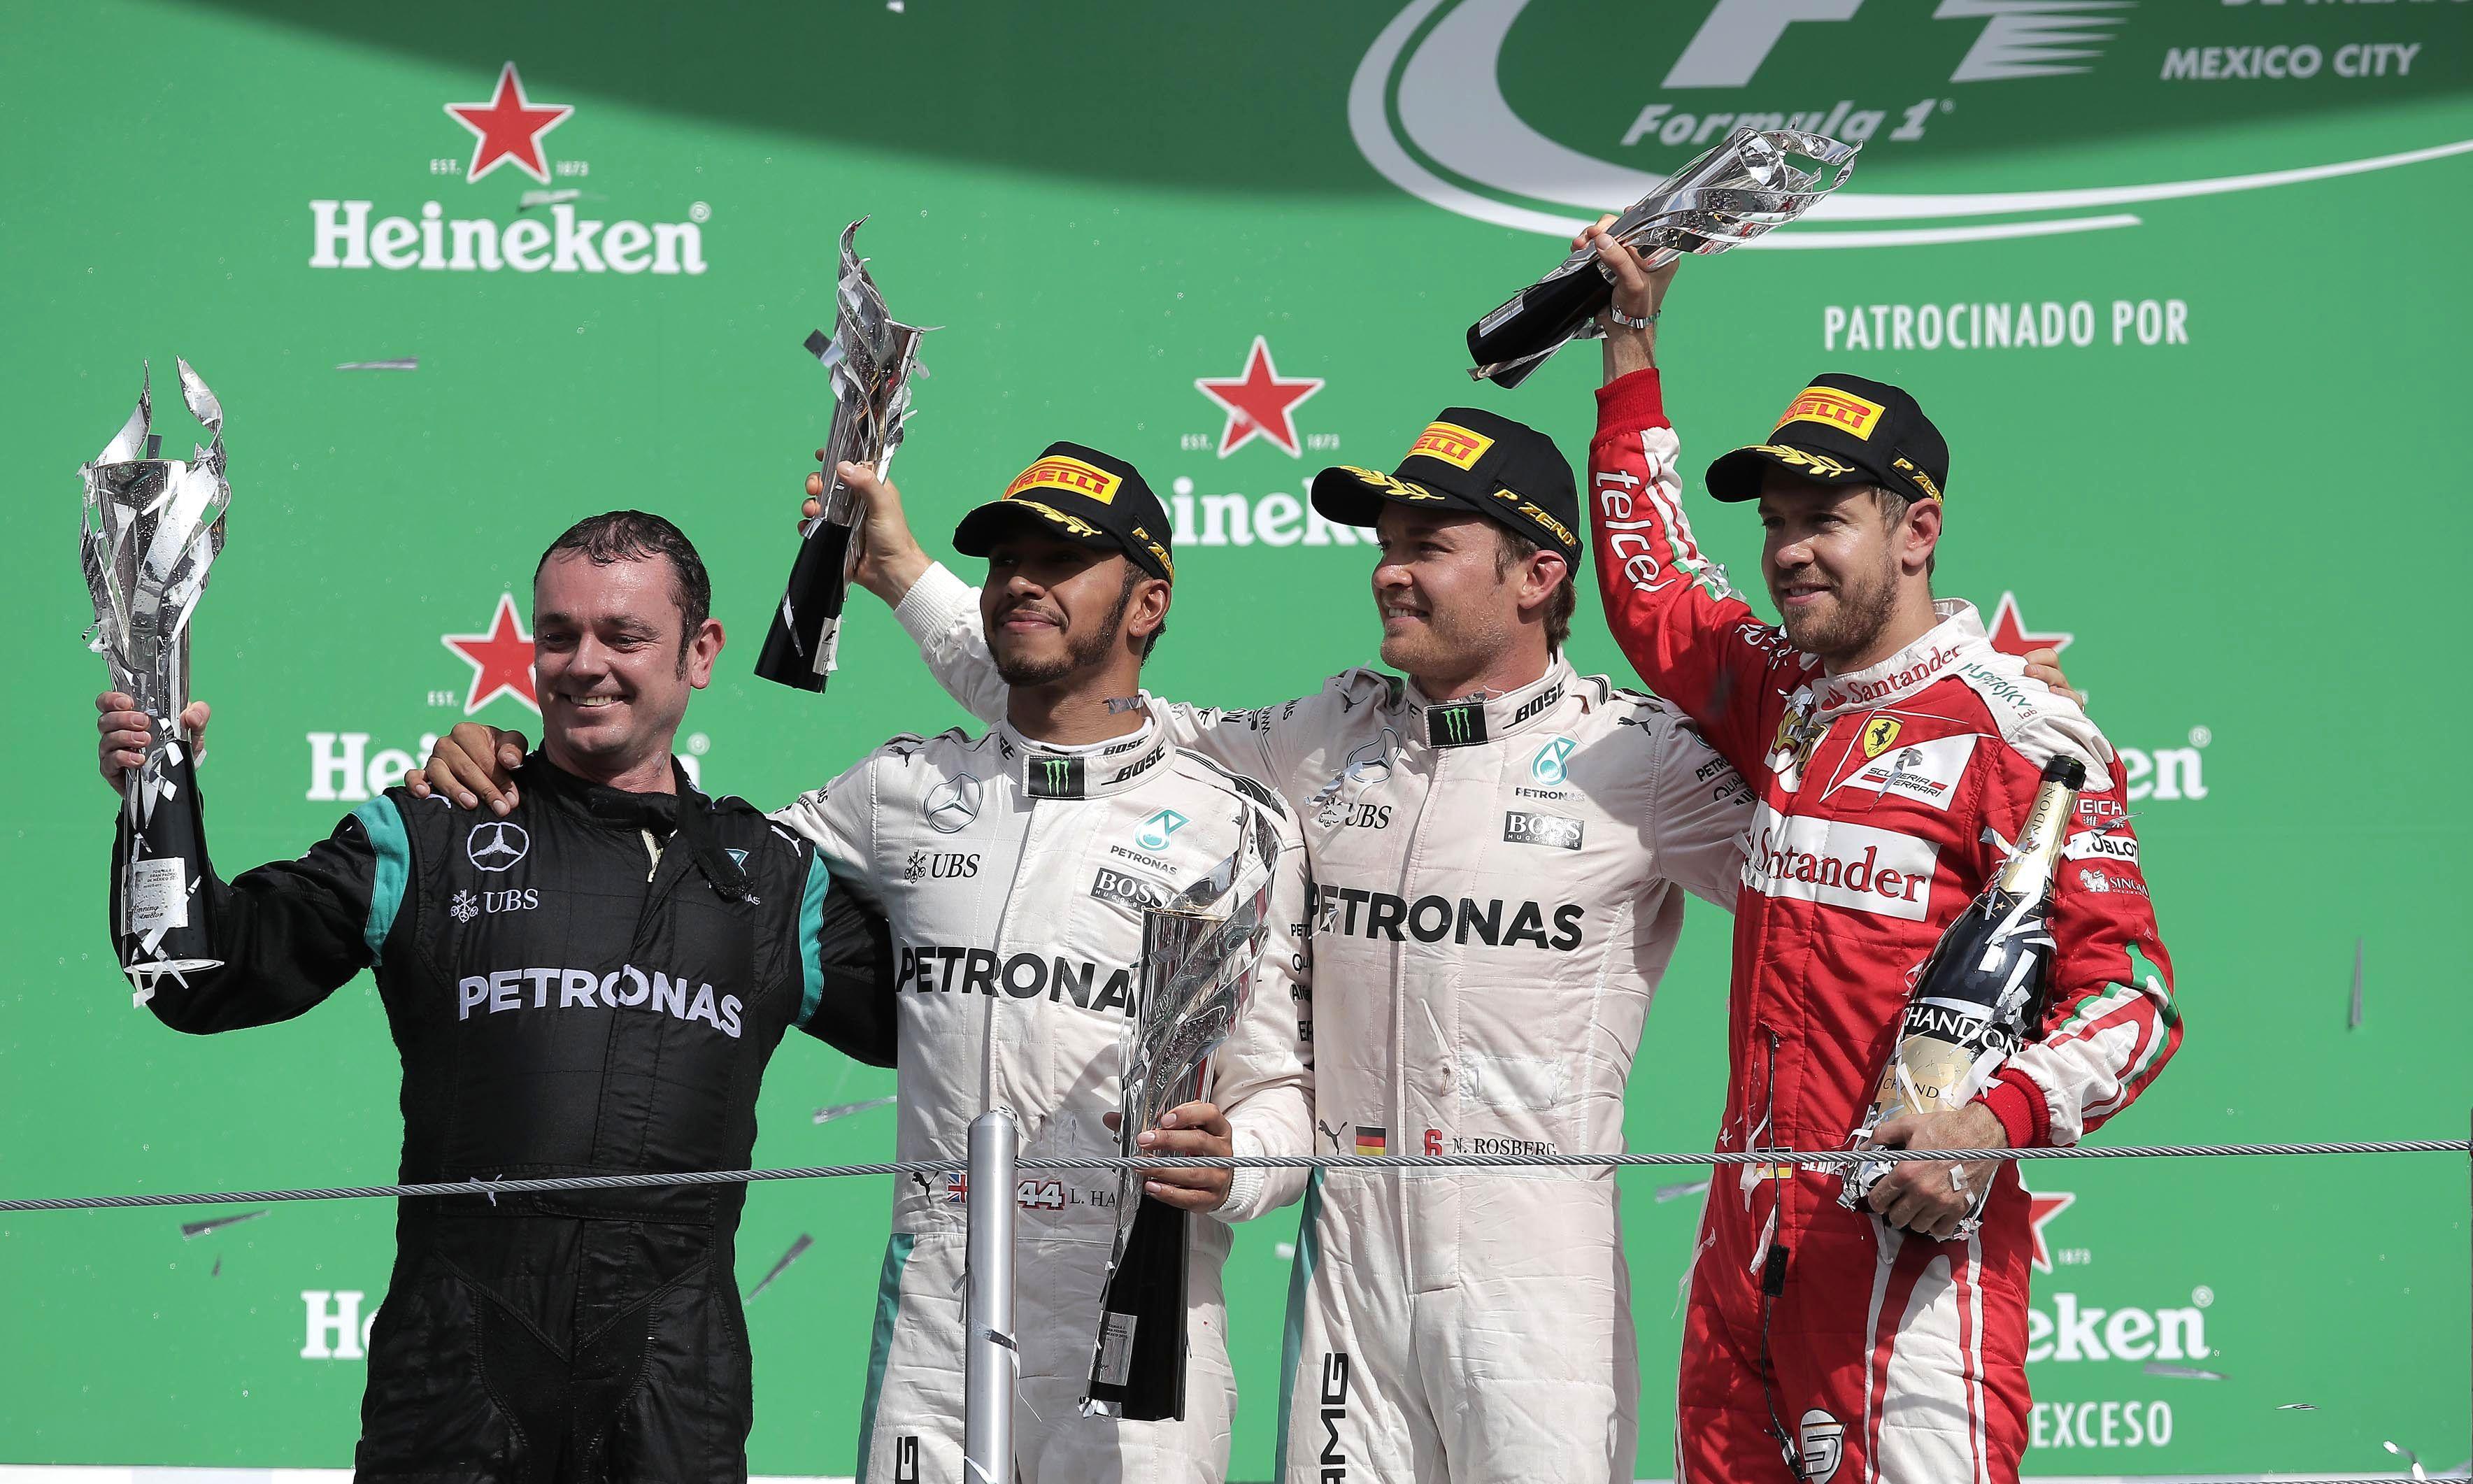 Sebastian Vettel may face sanction after F1 frustration with Ferrari erupts